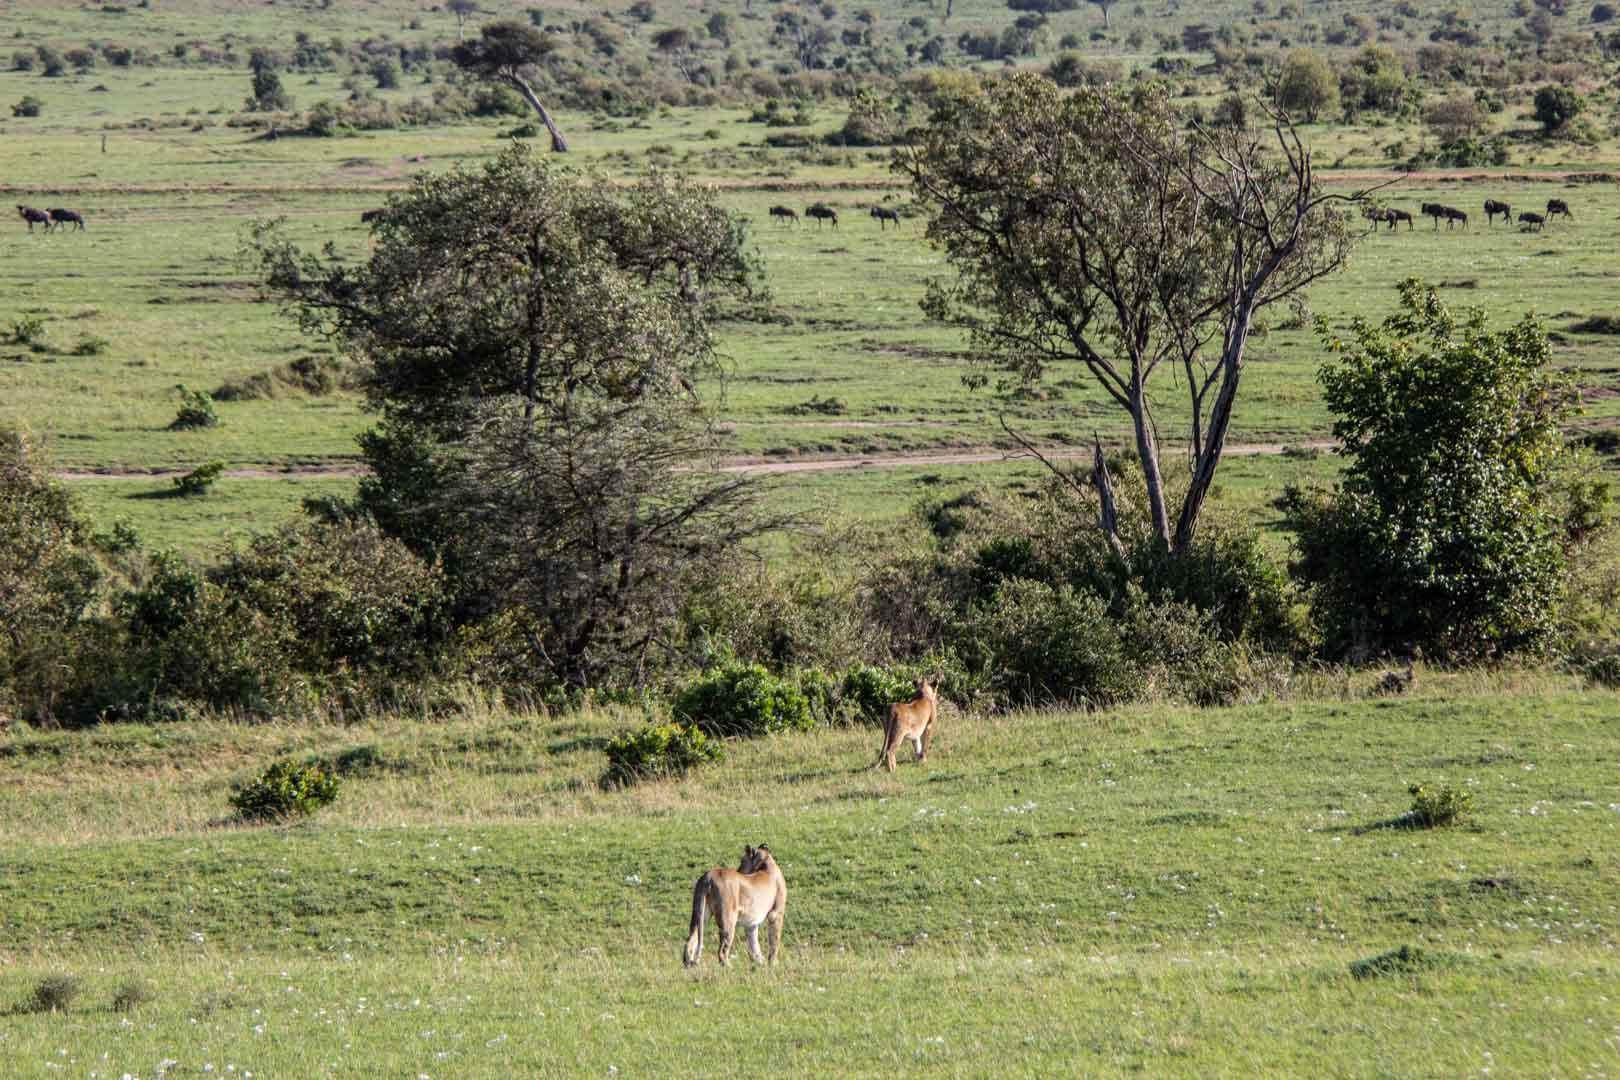 Leonas acechando a una manada de ñus, Masai Mara, Kenia